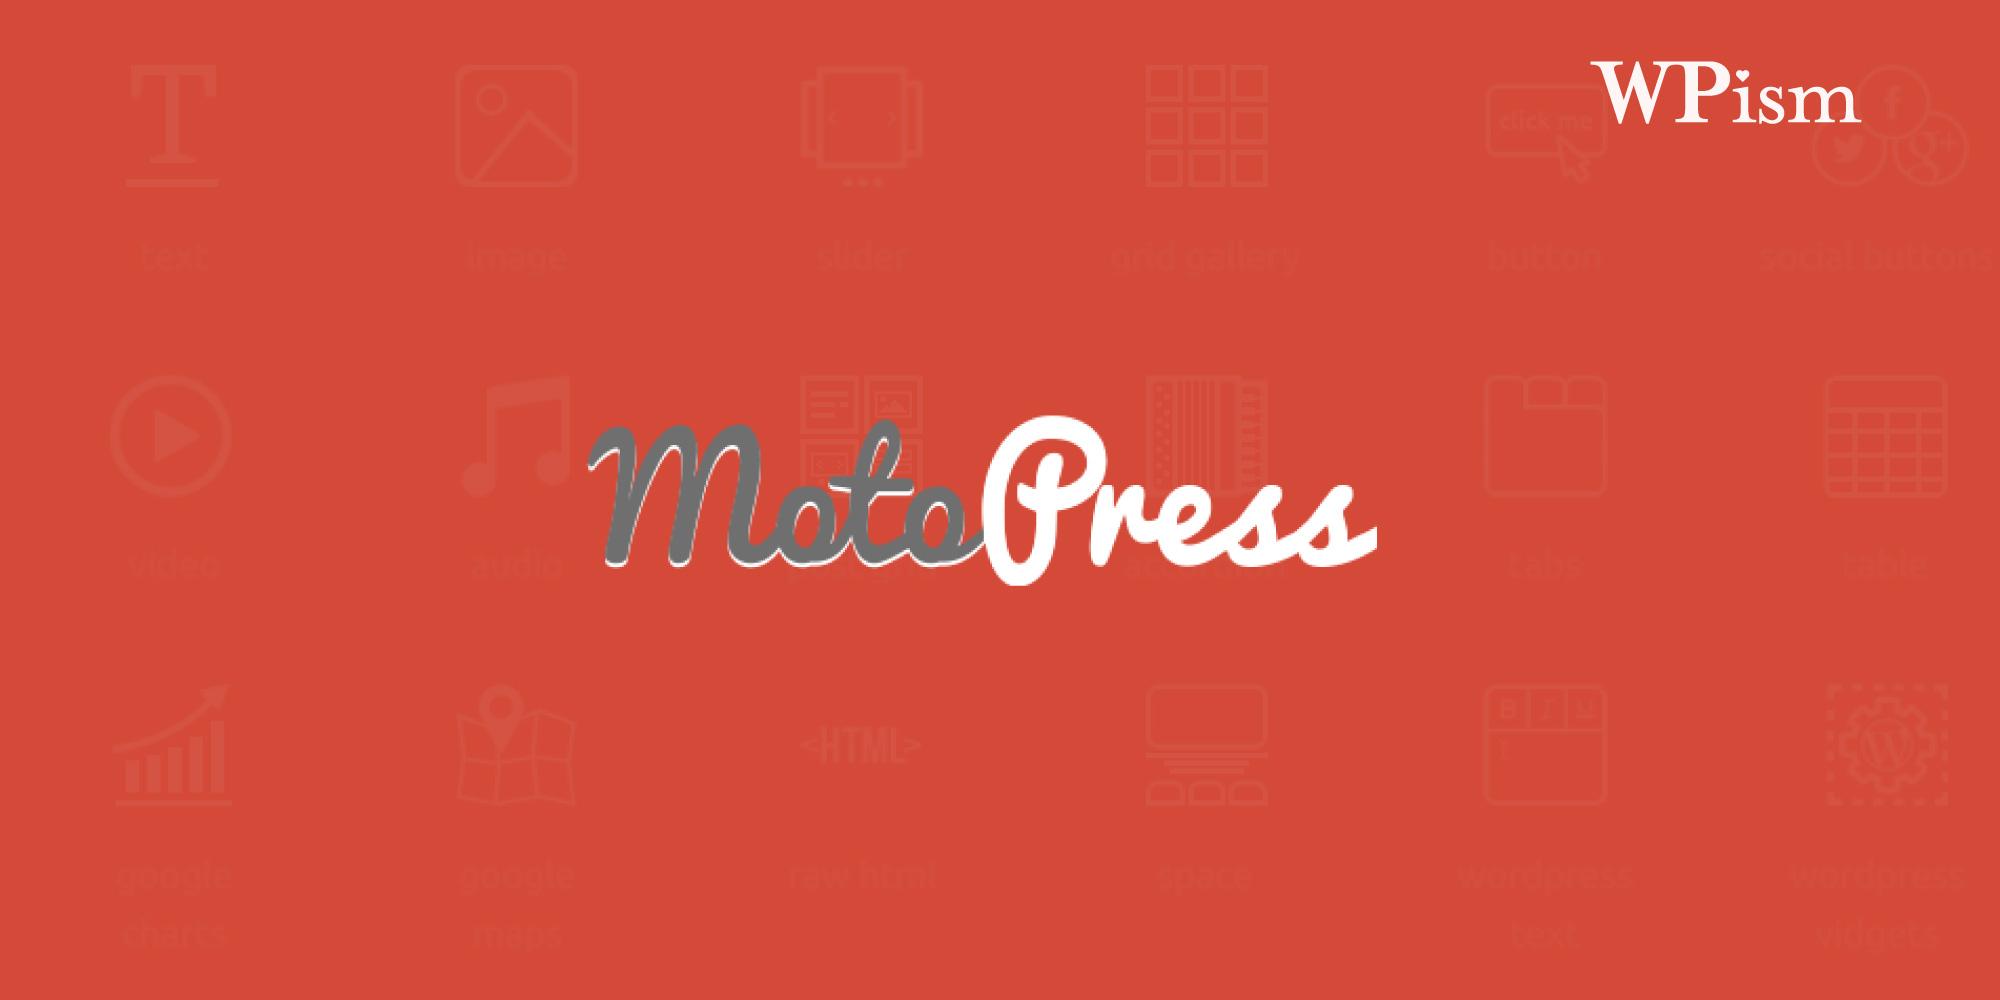 MotoPress Coupon Code Discount WordPress Pugins Themes